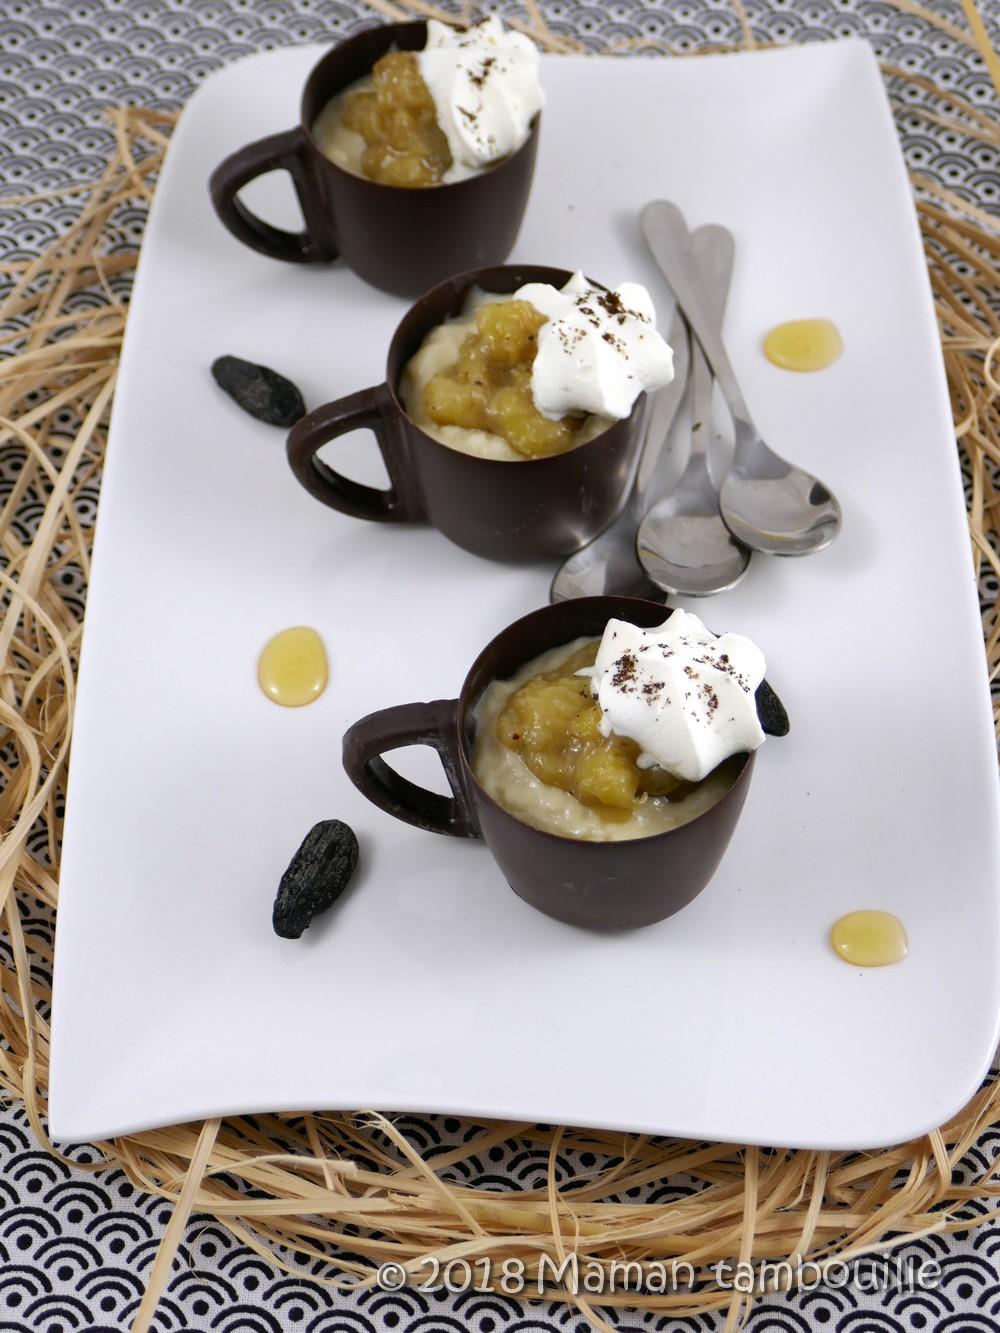 Crème miel tonka et sa compotée de banane